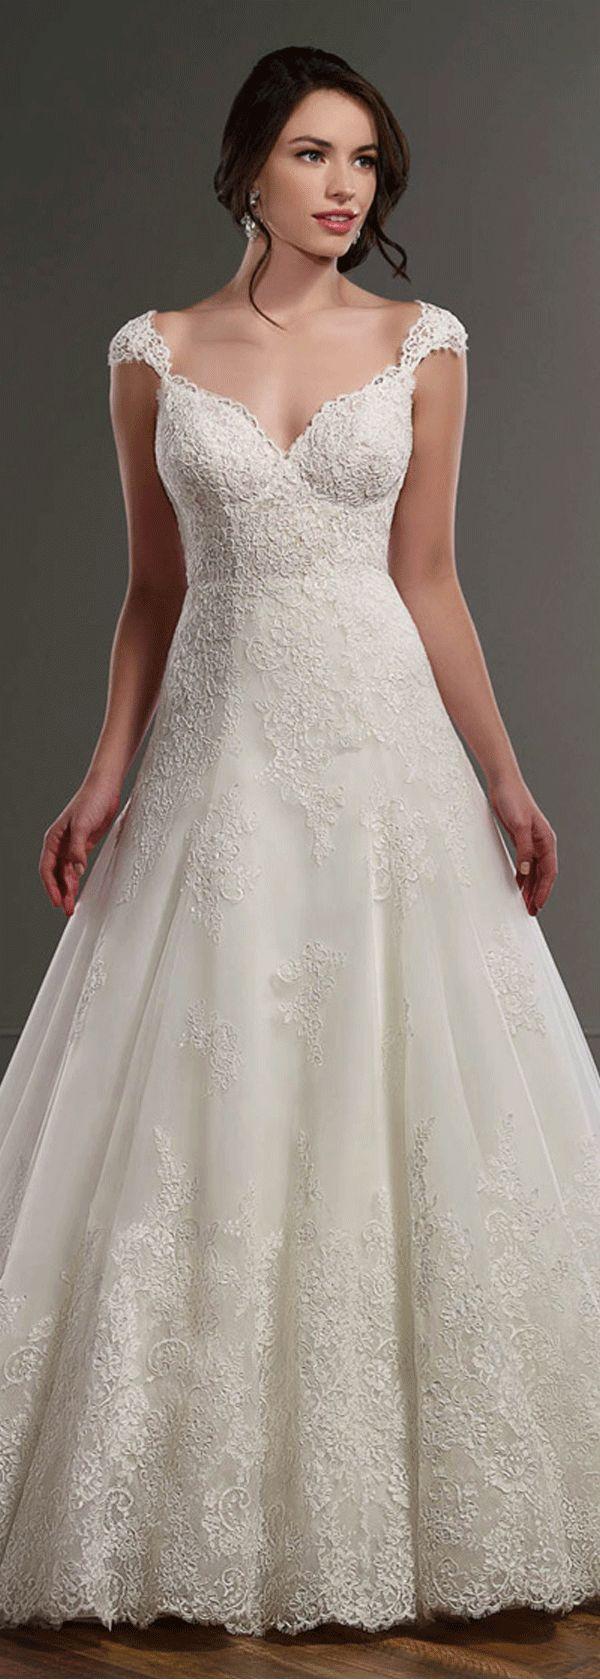 Wedding - Beautiful Wedding Dresses